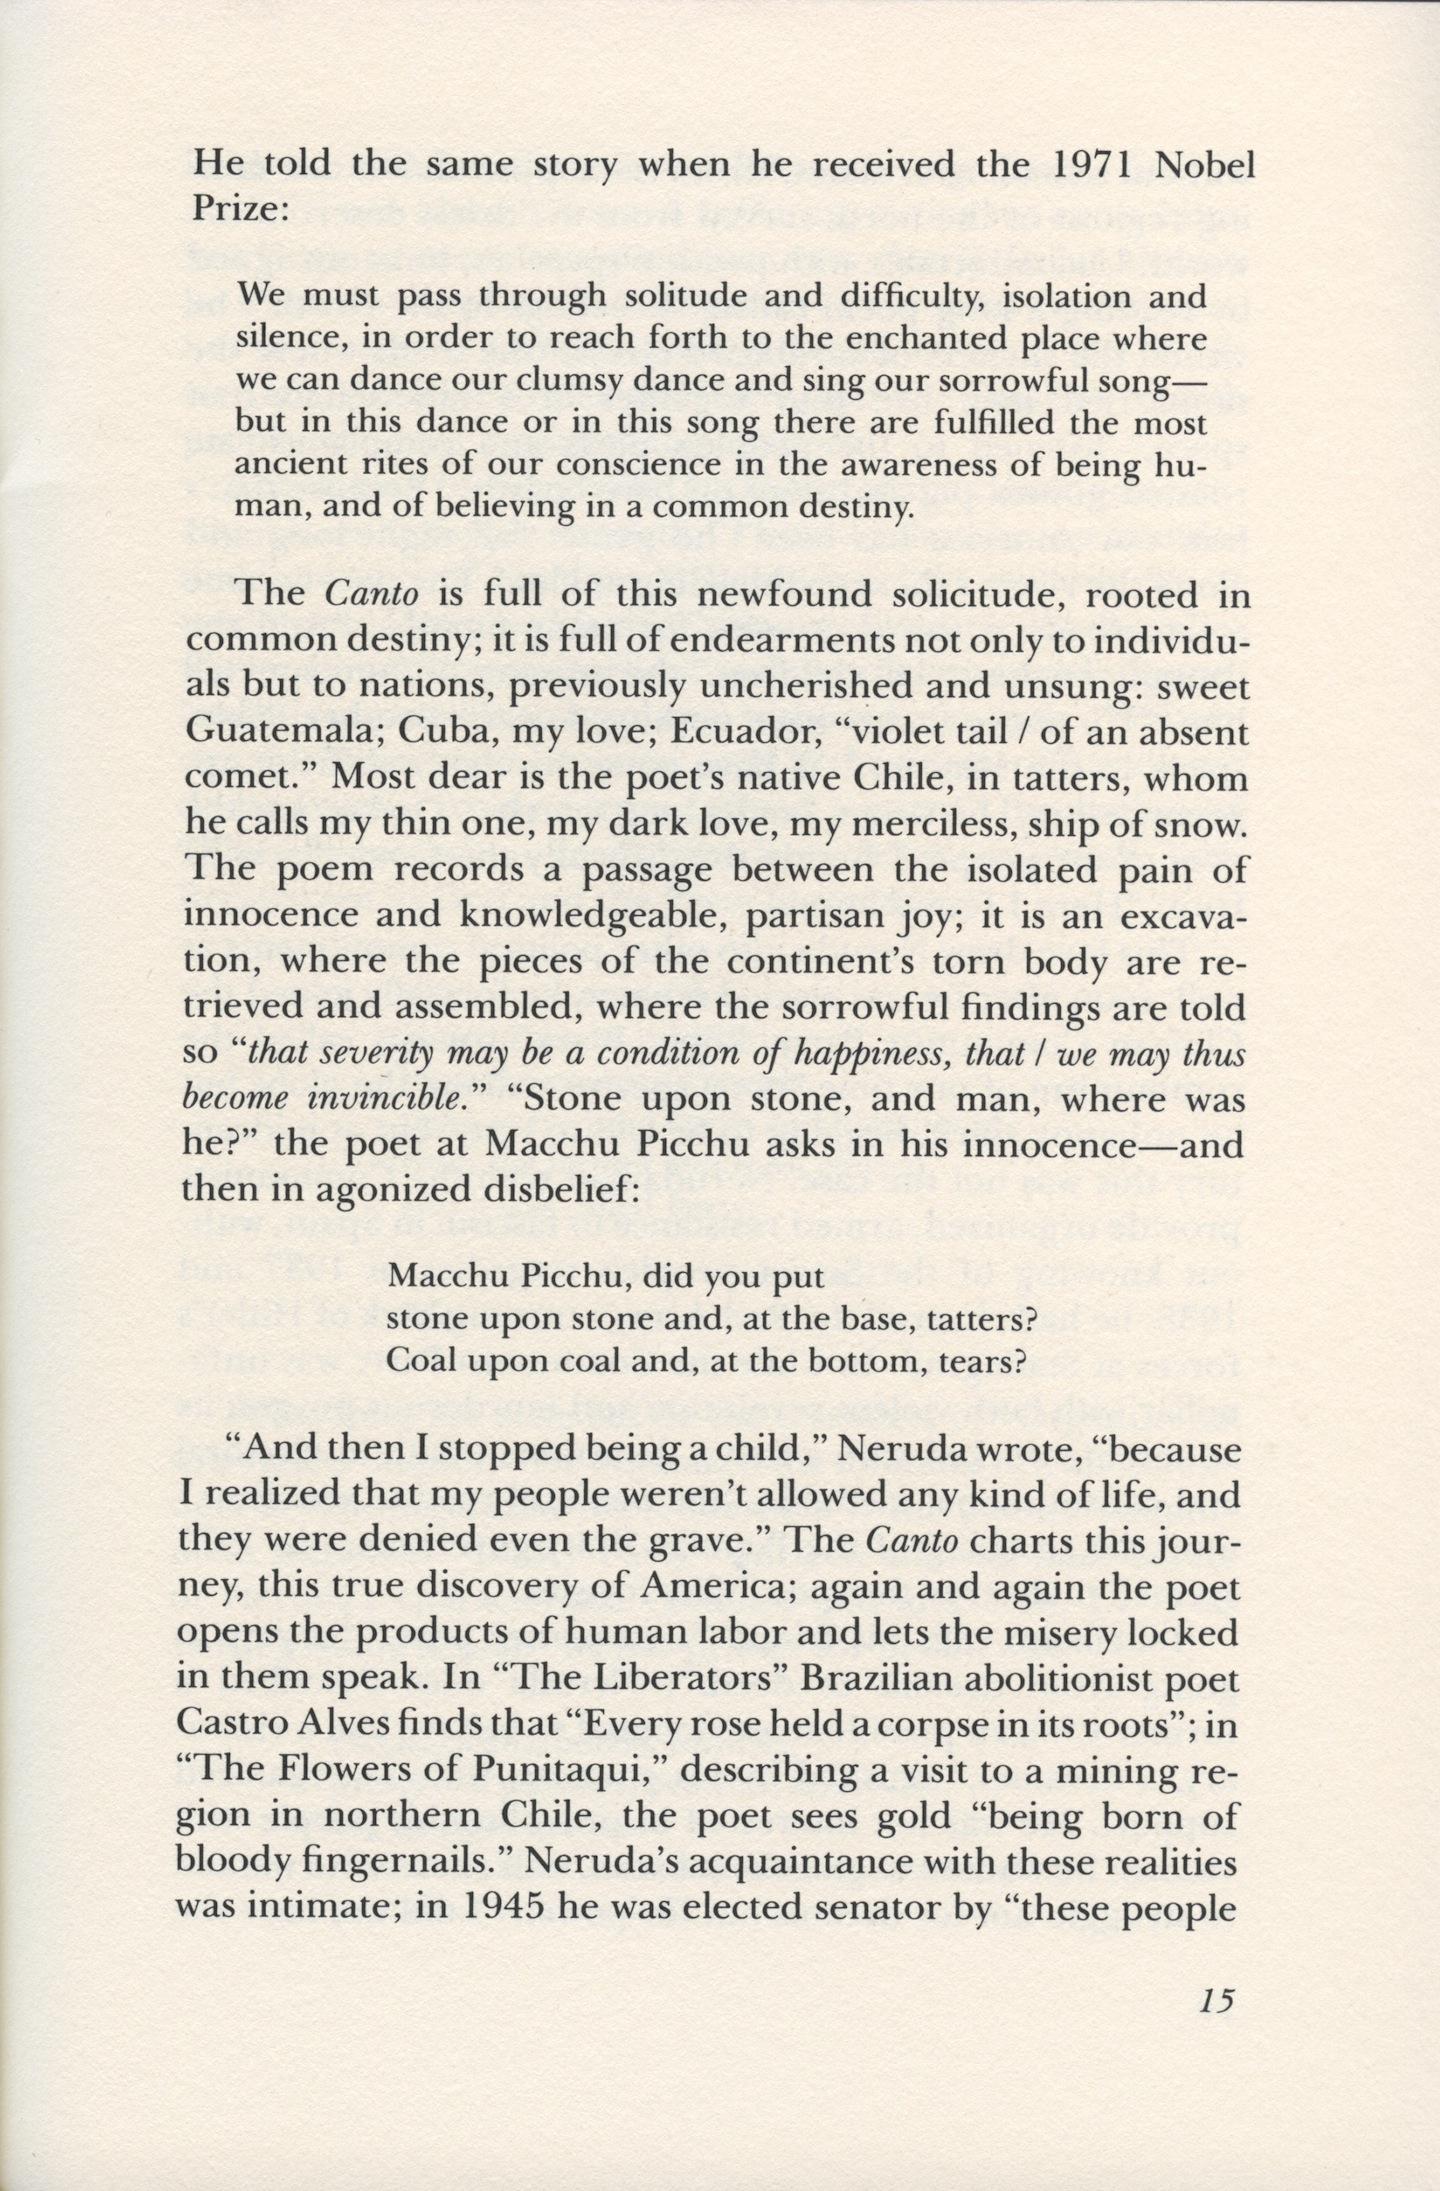 Neruda 9.jpeg